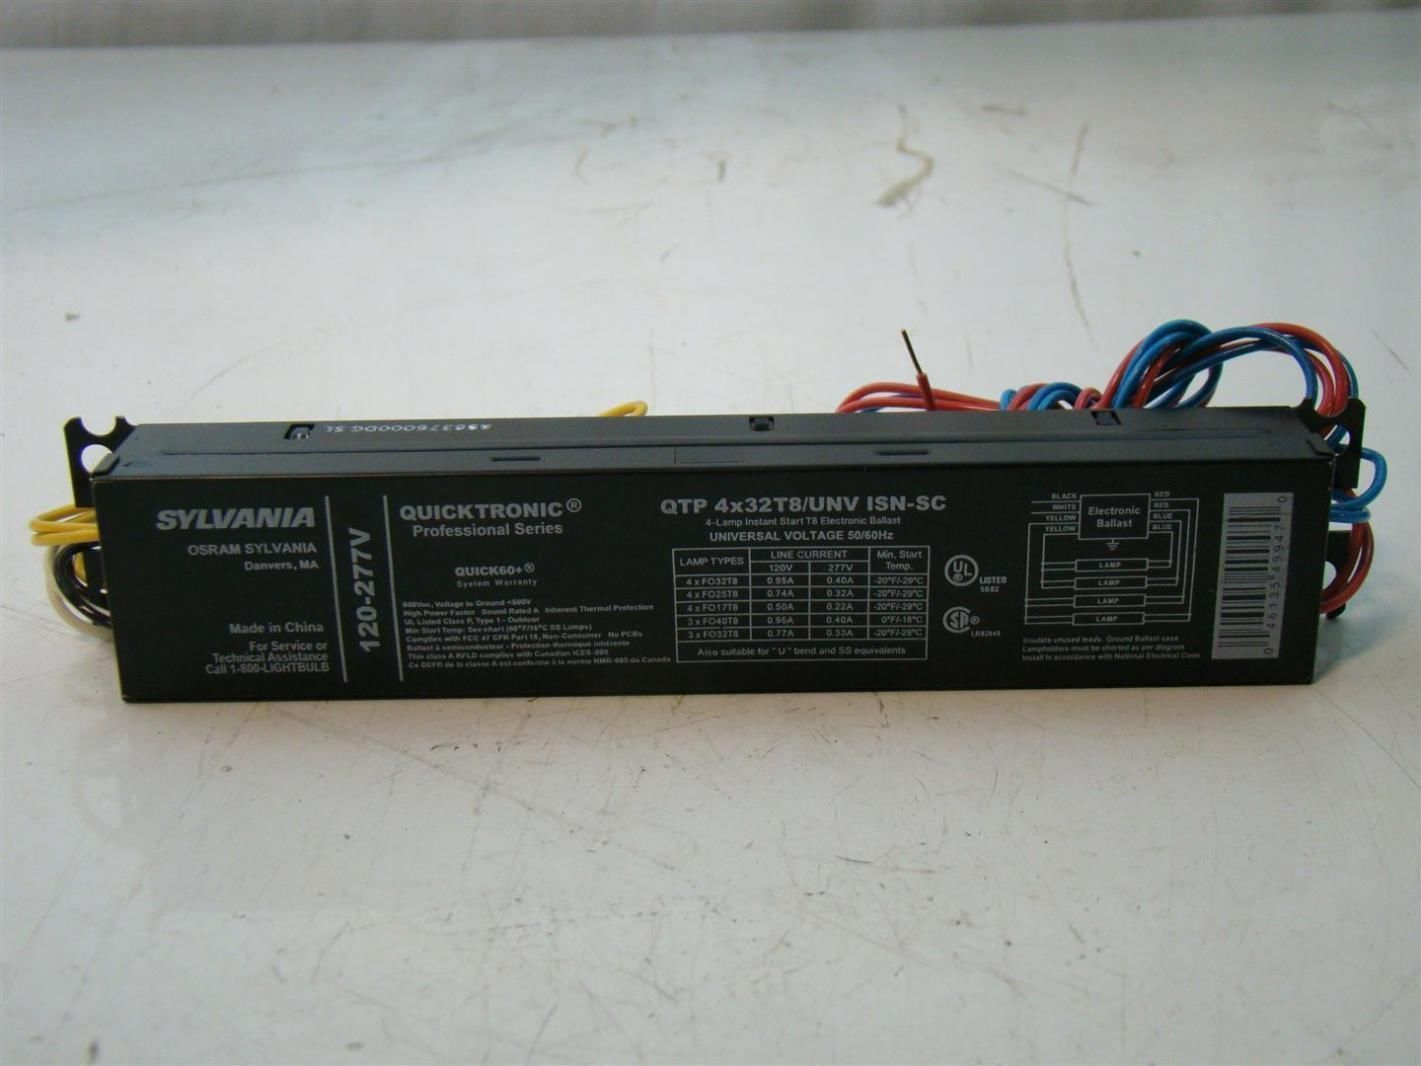 sylvania quicktronict8 ballast 120 277v qtp 4x32t8 unv isn sc ebay  details about sylvania quicktronict8 ballast 120 277v qtp 4x32t8 unv isn sc